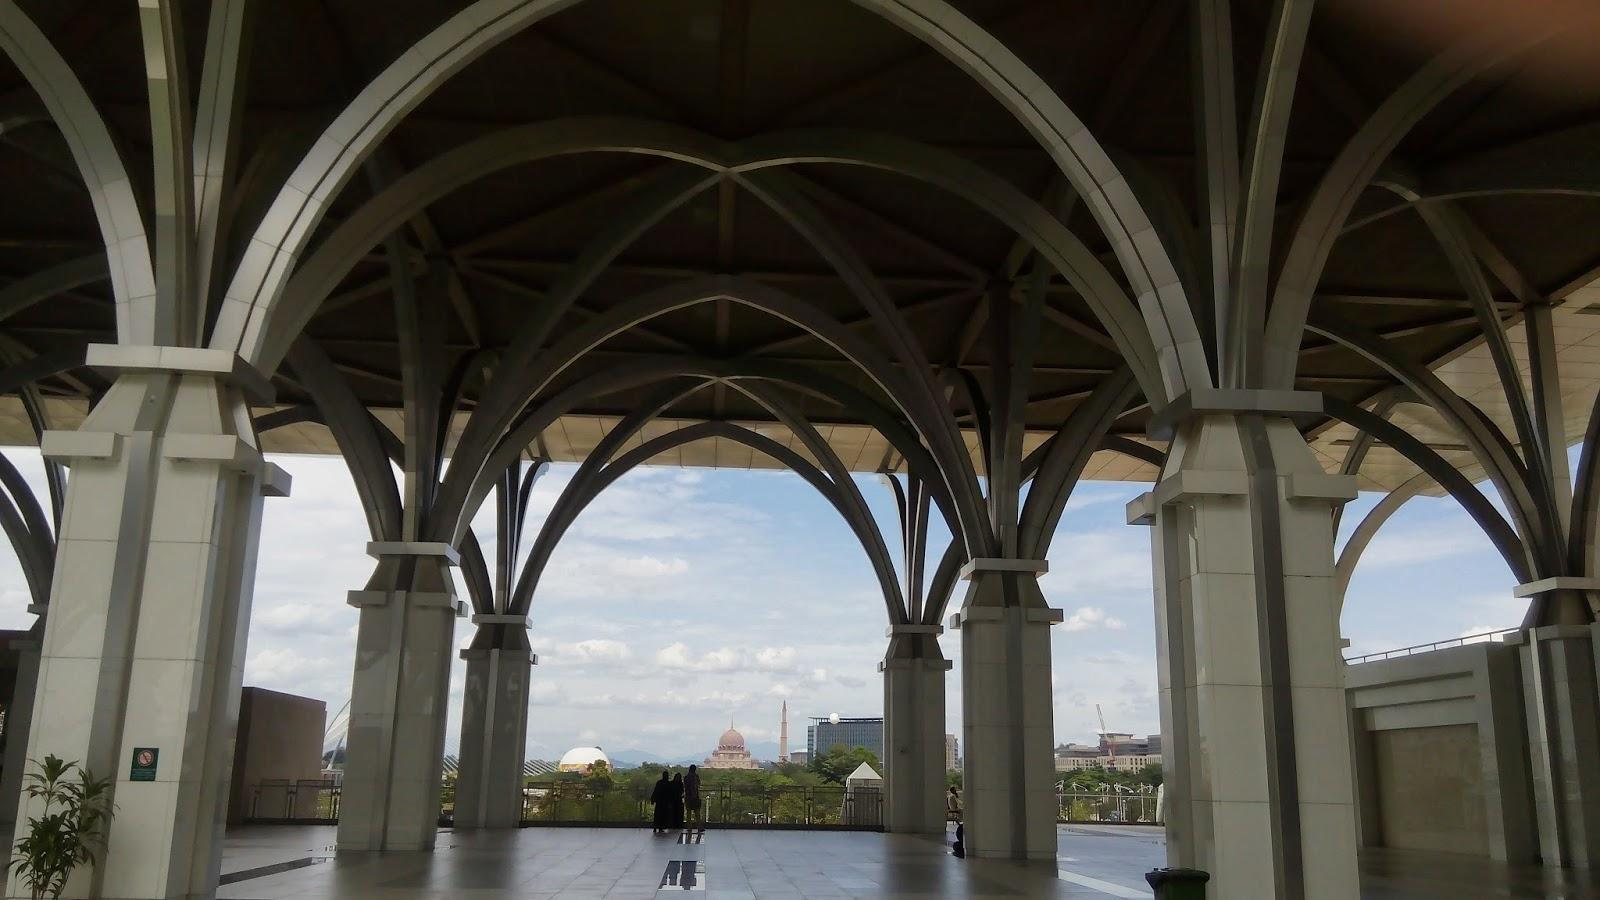 Masjid Tuanku Zainal Abidin, Masjid Besi, Silhoutte, Masjid Putra, Putrajaya, arzmoha, visit malaysia,